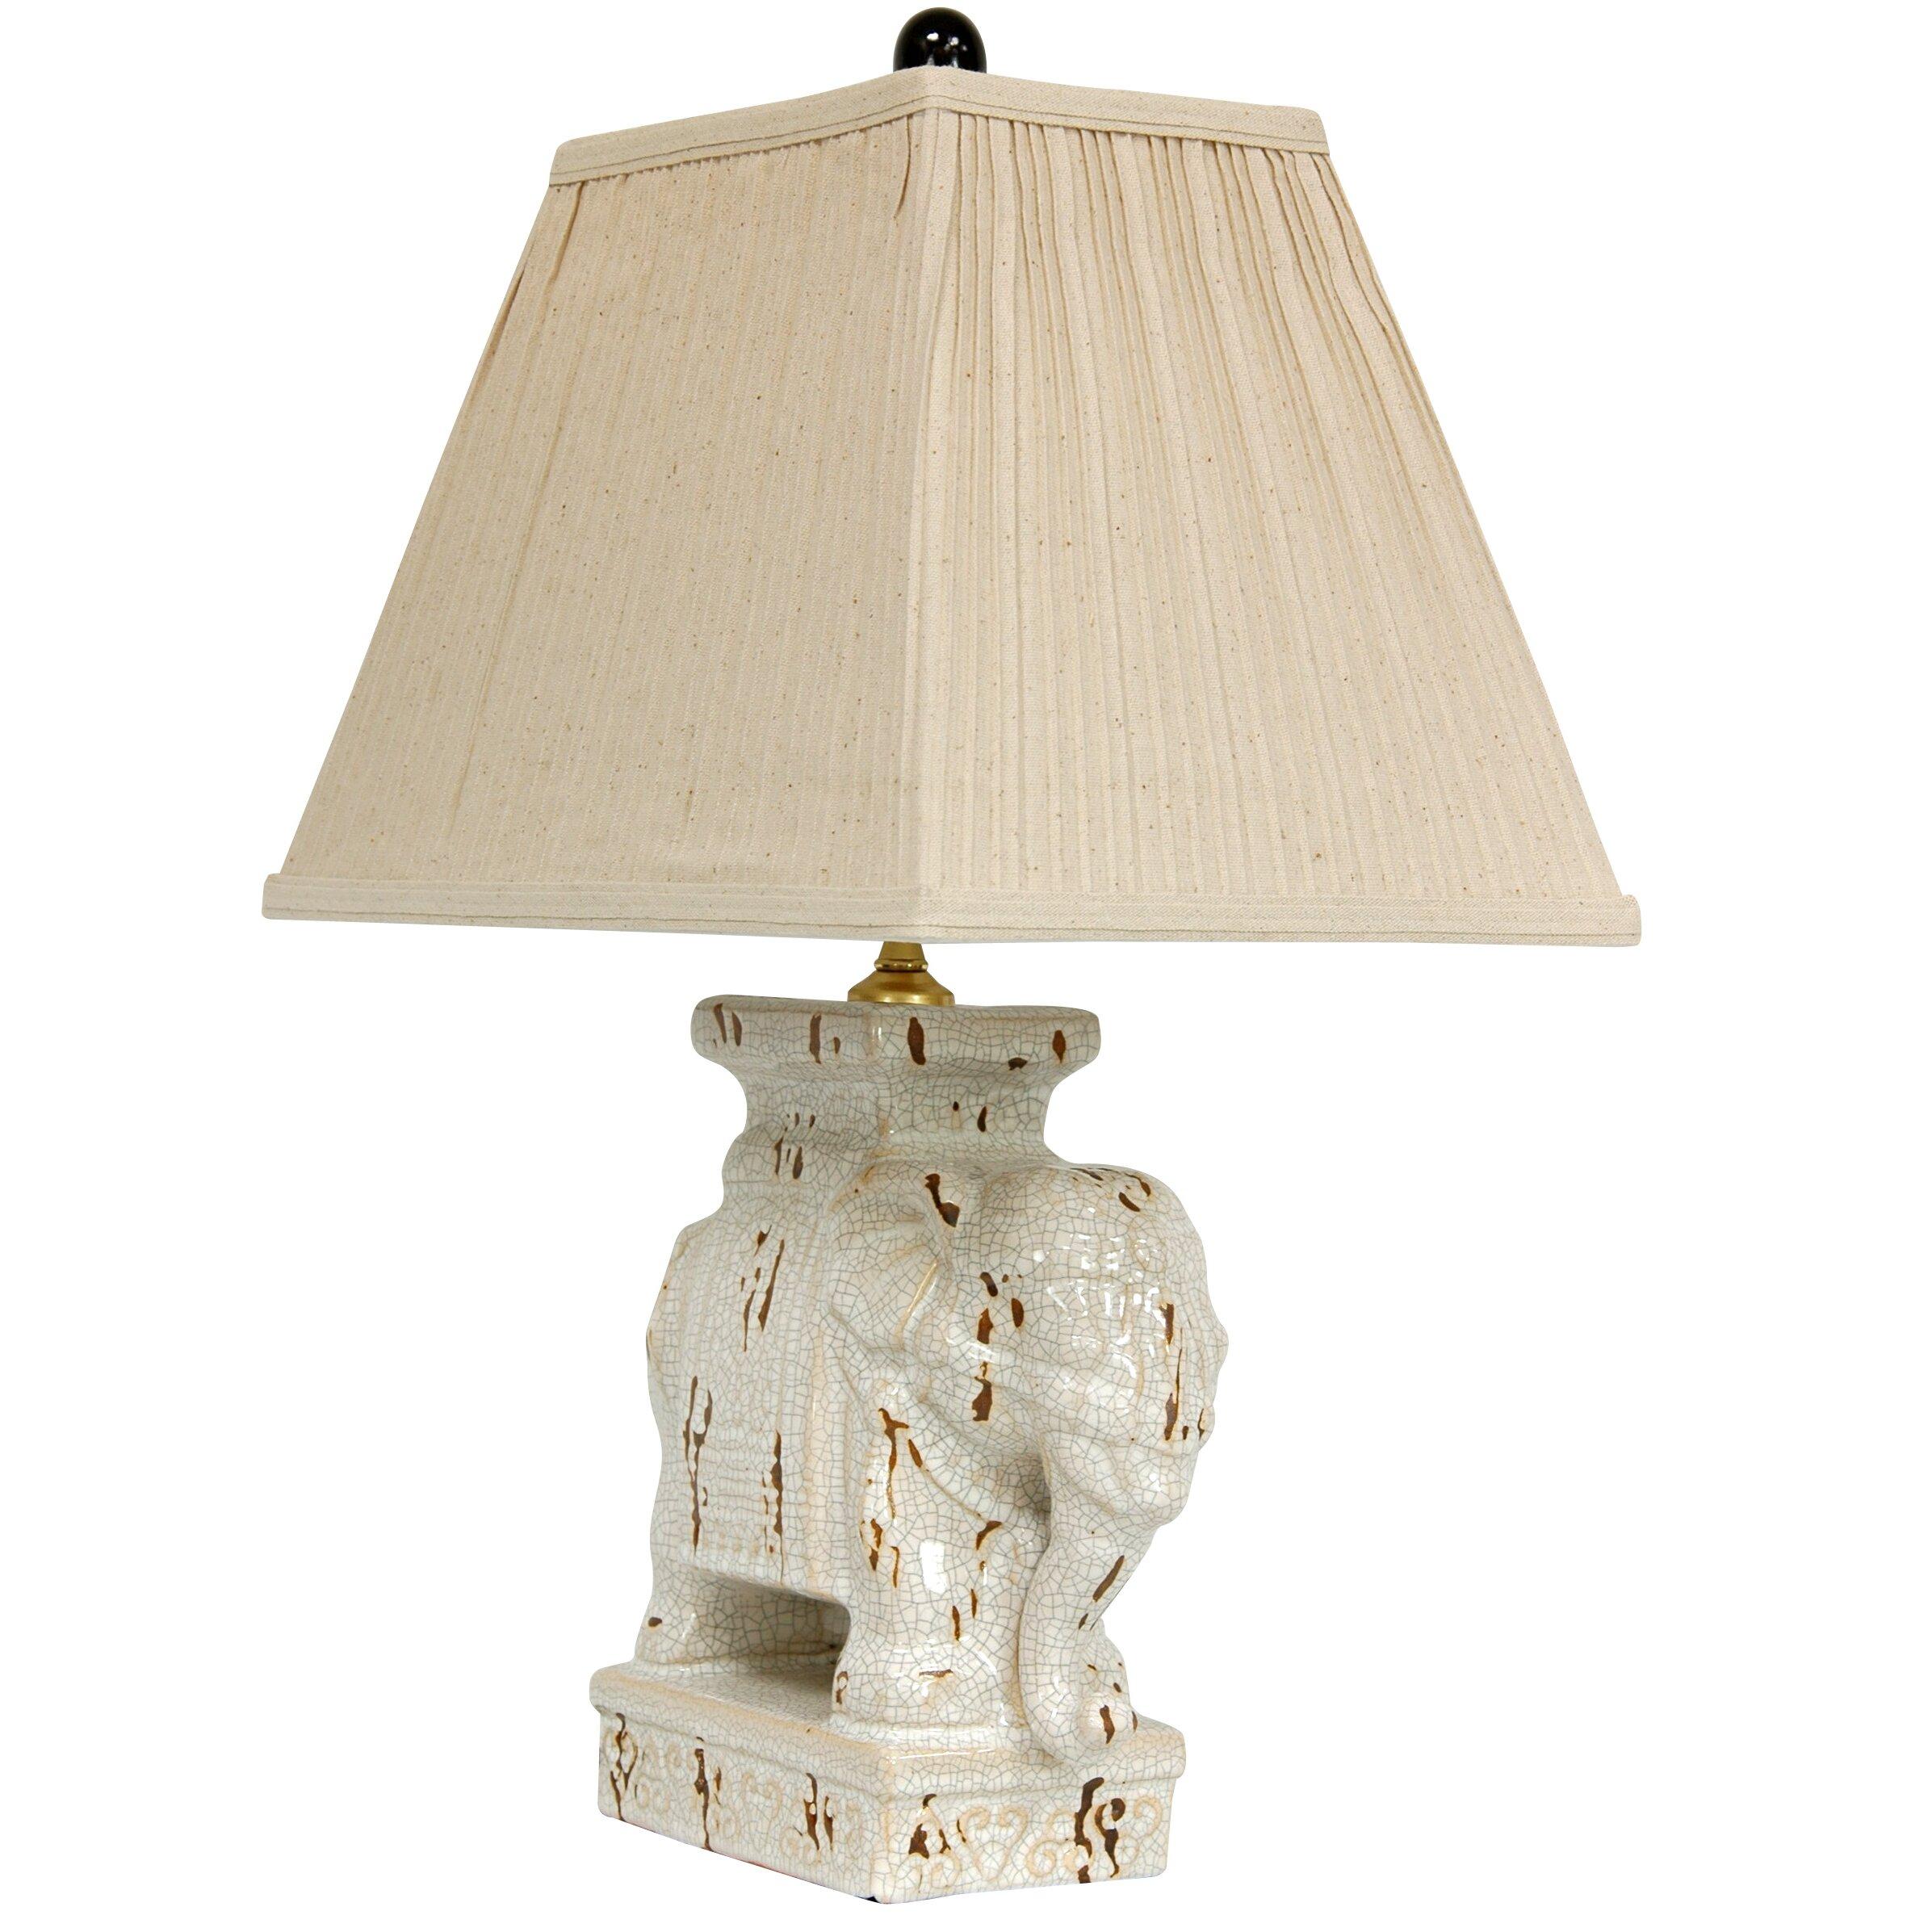 oriental furniture elephant 22 table lamp reviews wayfair. Black Bedroom Furniture Sets. Home Design Ideas